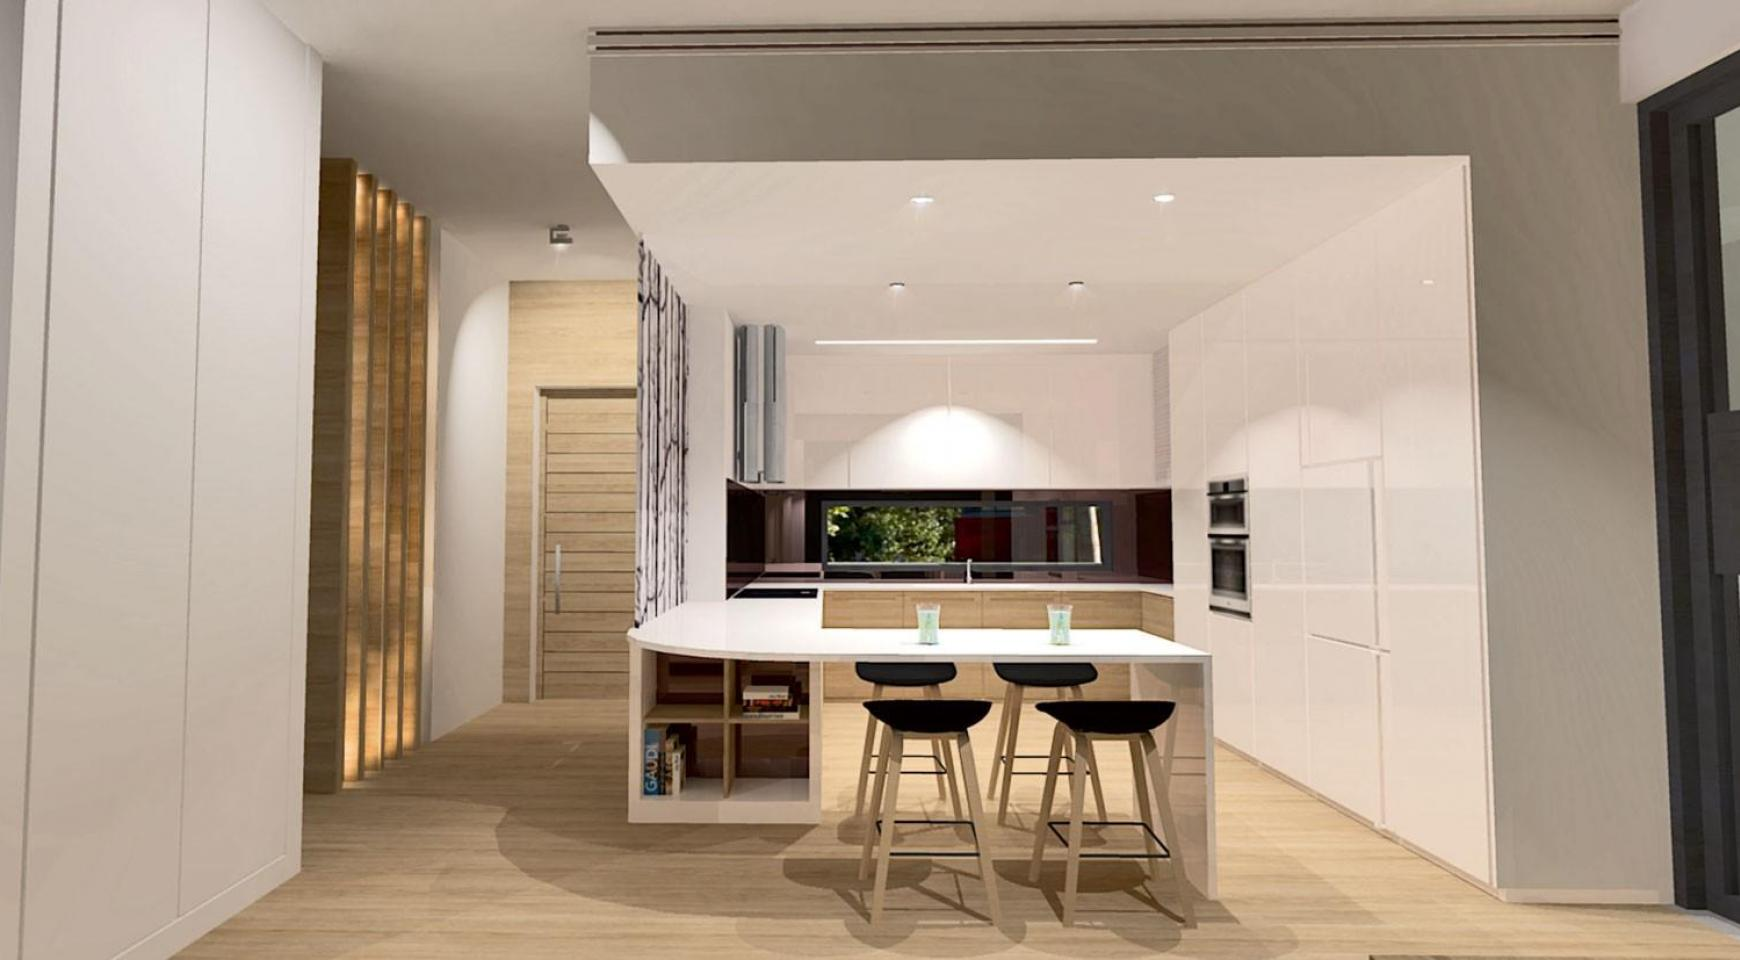 Spacious 4 Bedroom Villa in a New Complex in Agios Athanasios Area - 9